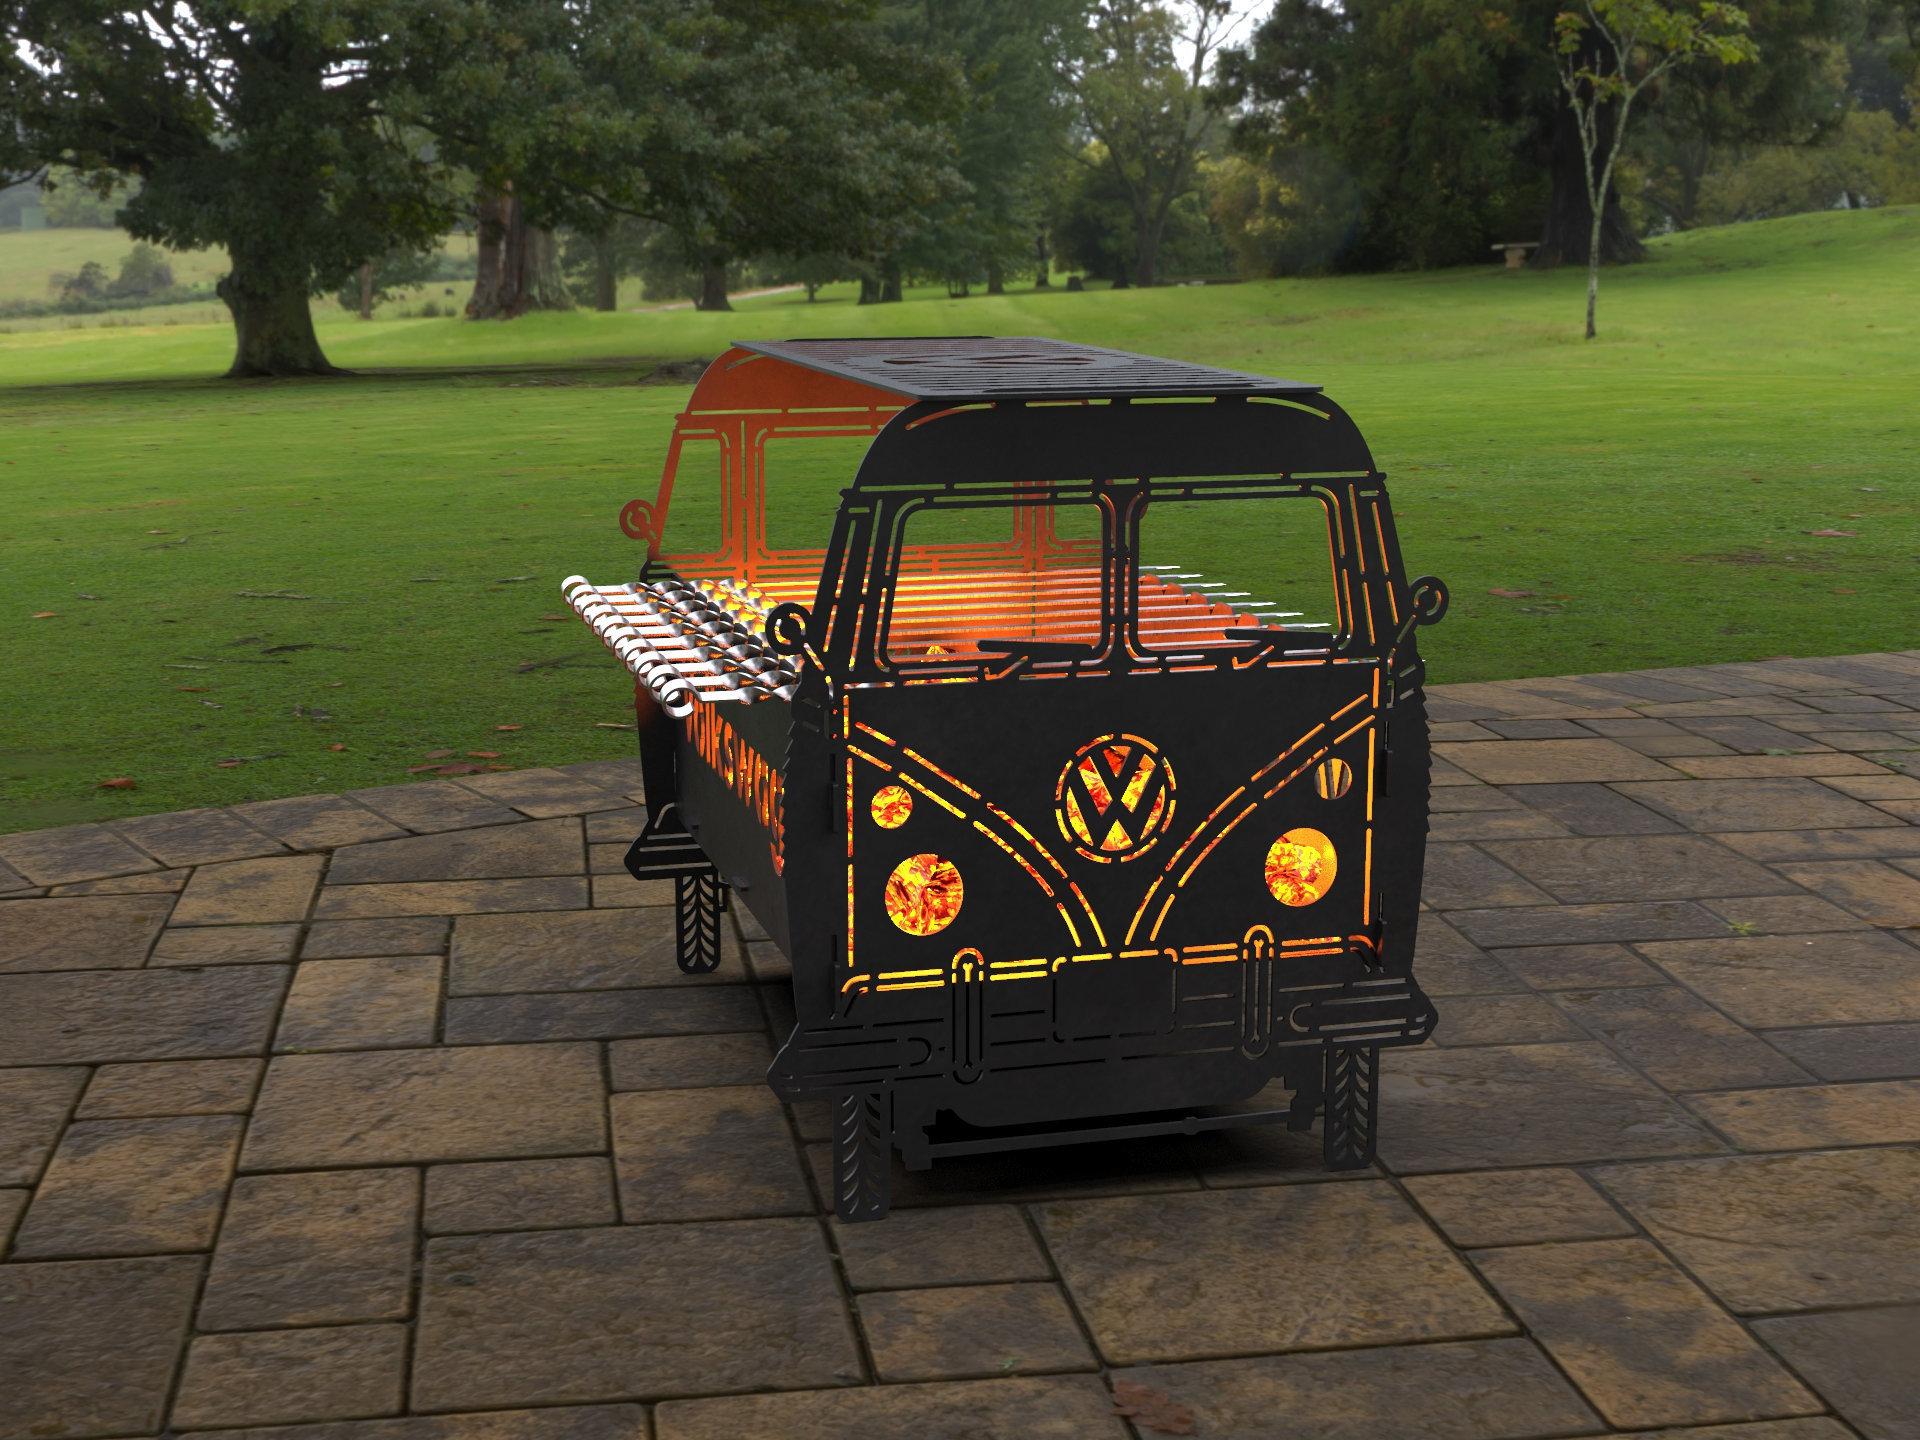 car Mangal Collapsible FirePit Gelandewagen Fire Pit SVG for CNC Bbq Grill Digital product Barbecue files DXF Laser Plasma